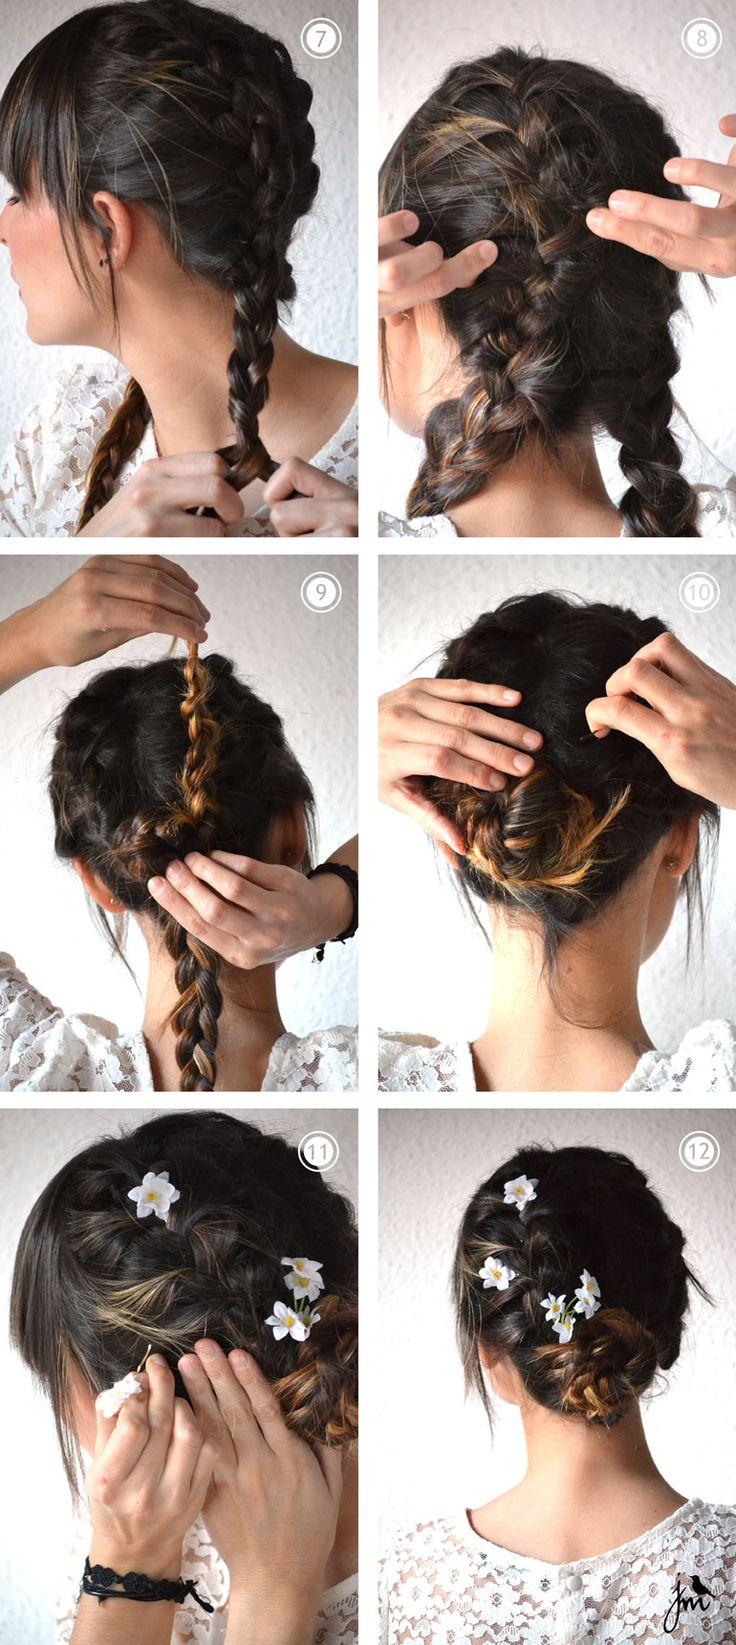 ➳➳➳☮American Hippie Bohemian Boho Bohéme Feathers Gypsy Spirit Bizu Baroque Tati Tati Style - Hair Tutorial